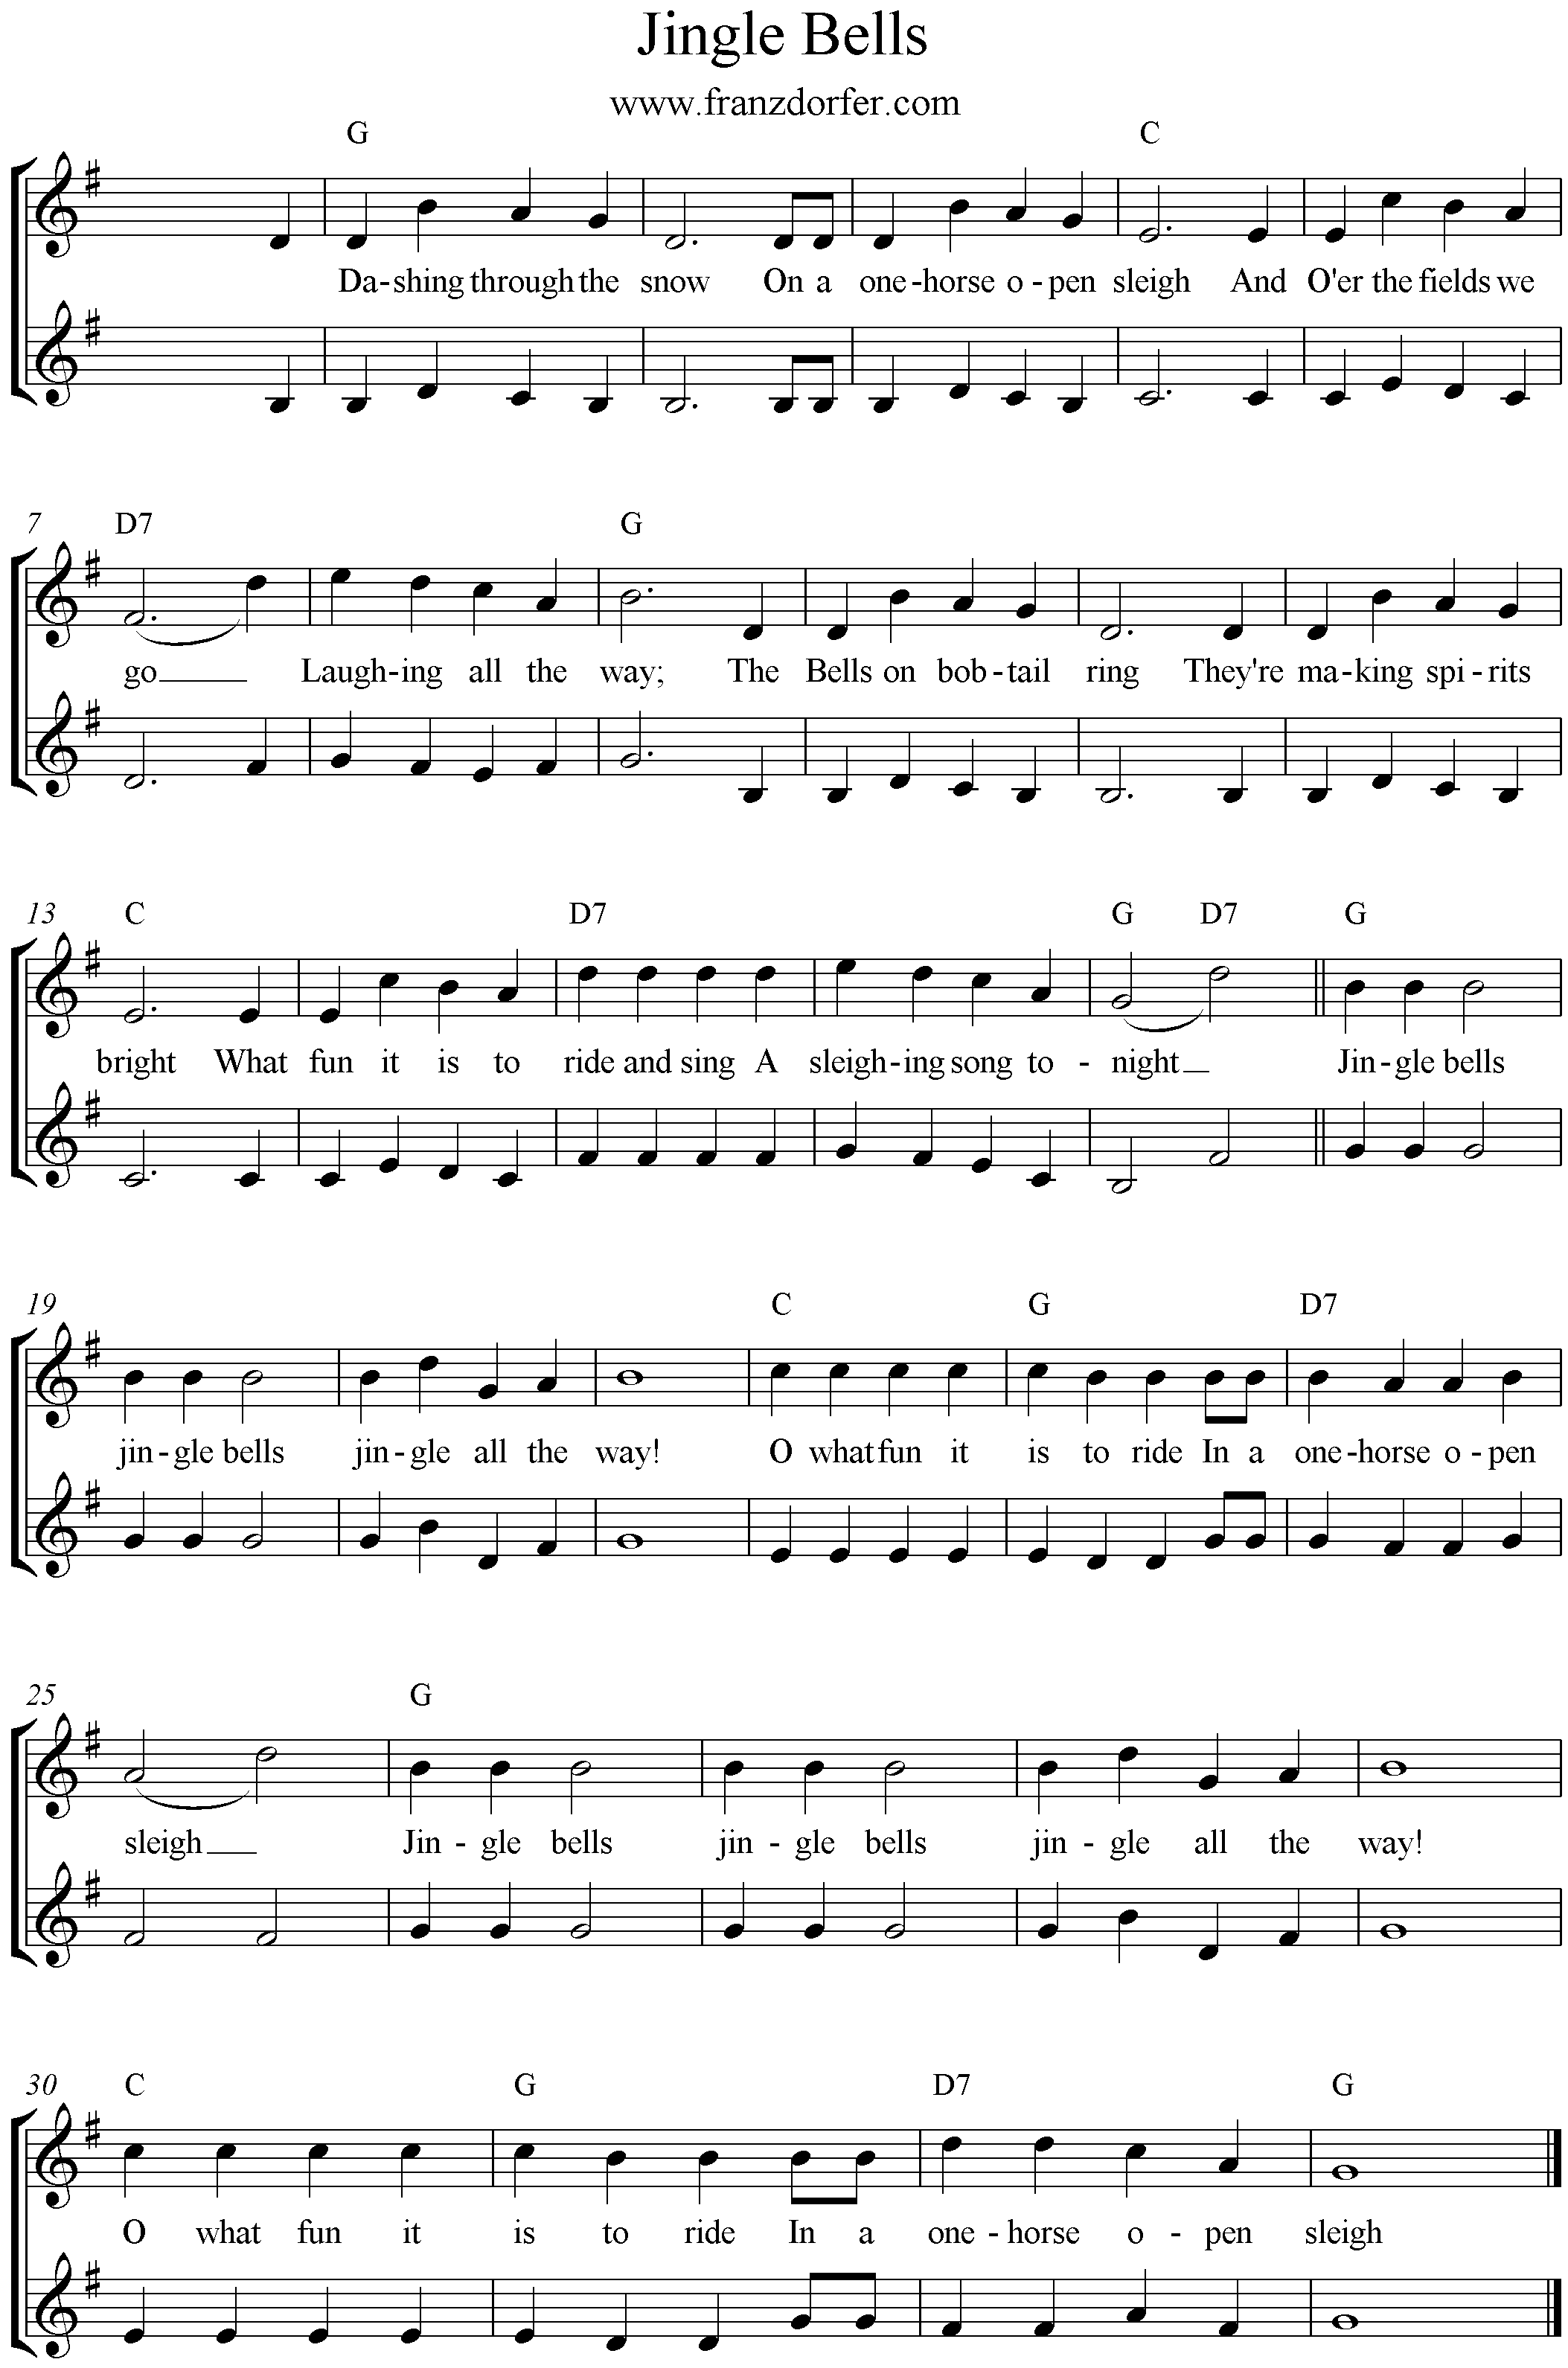 Jingle Bells 2stimmig